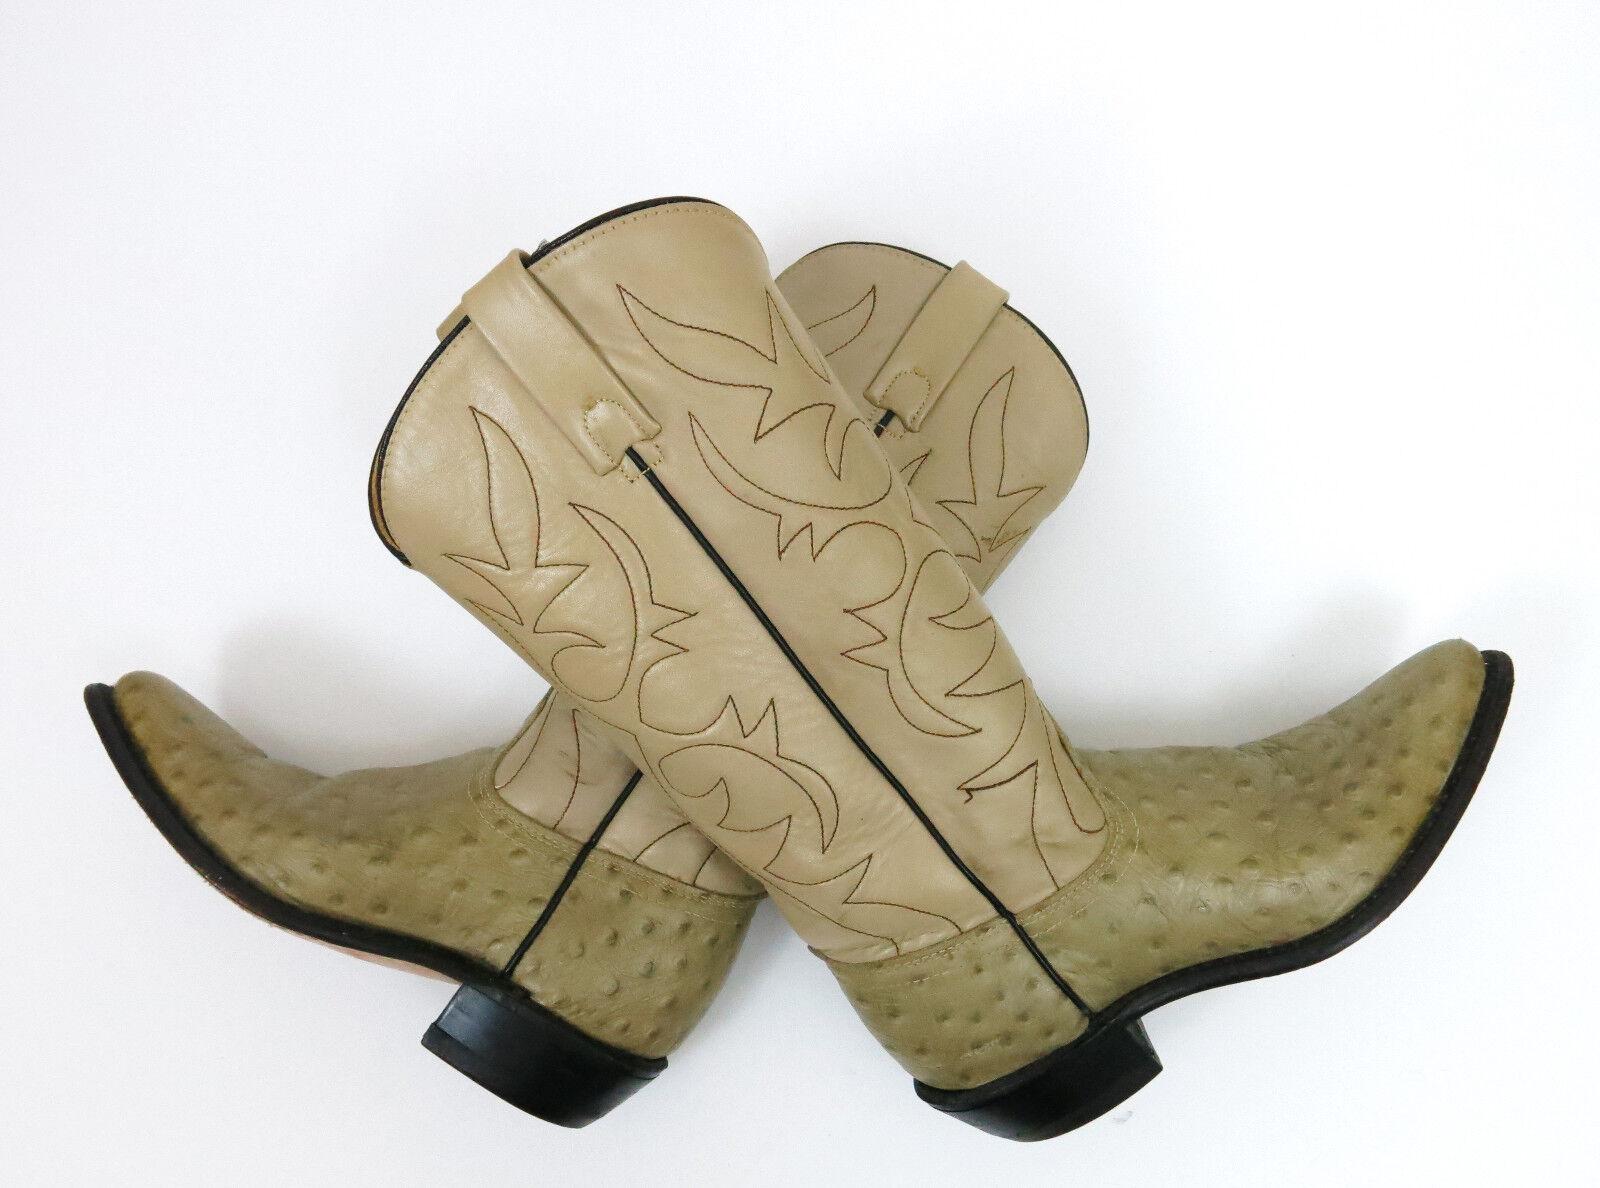 ACME Ostrich Grain Cowhide Western Cowboy Boots Vintage Leather Beige Cream 5 A